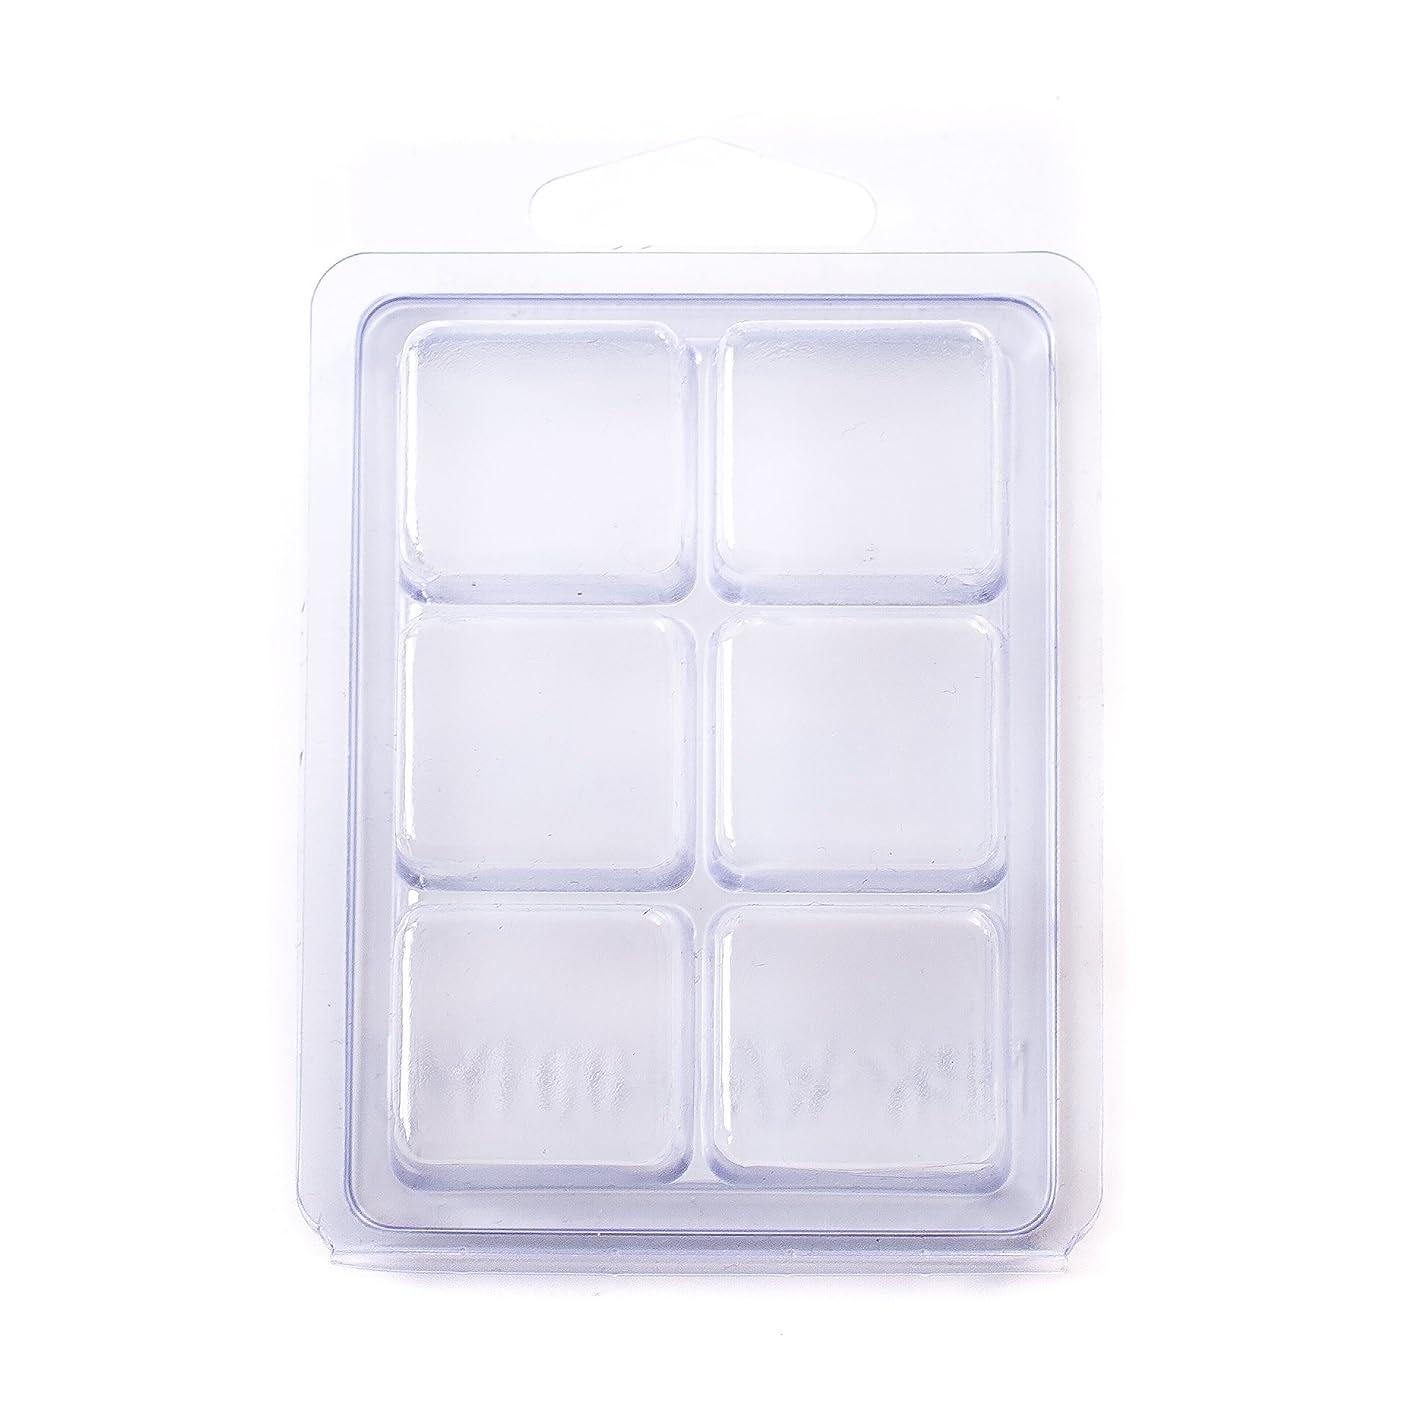 6 Cavity Wax Tart Clamshell Mould x 10